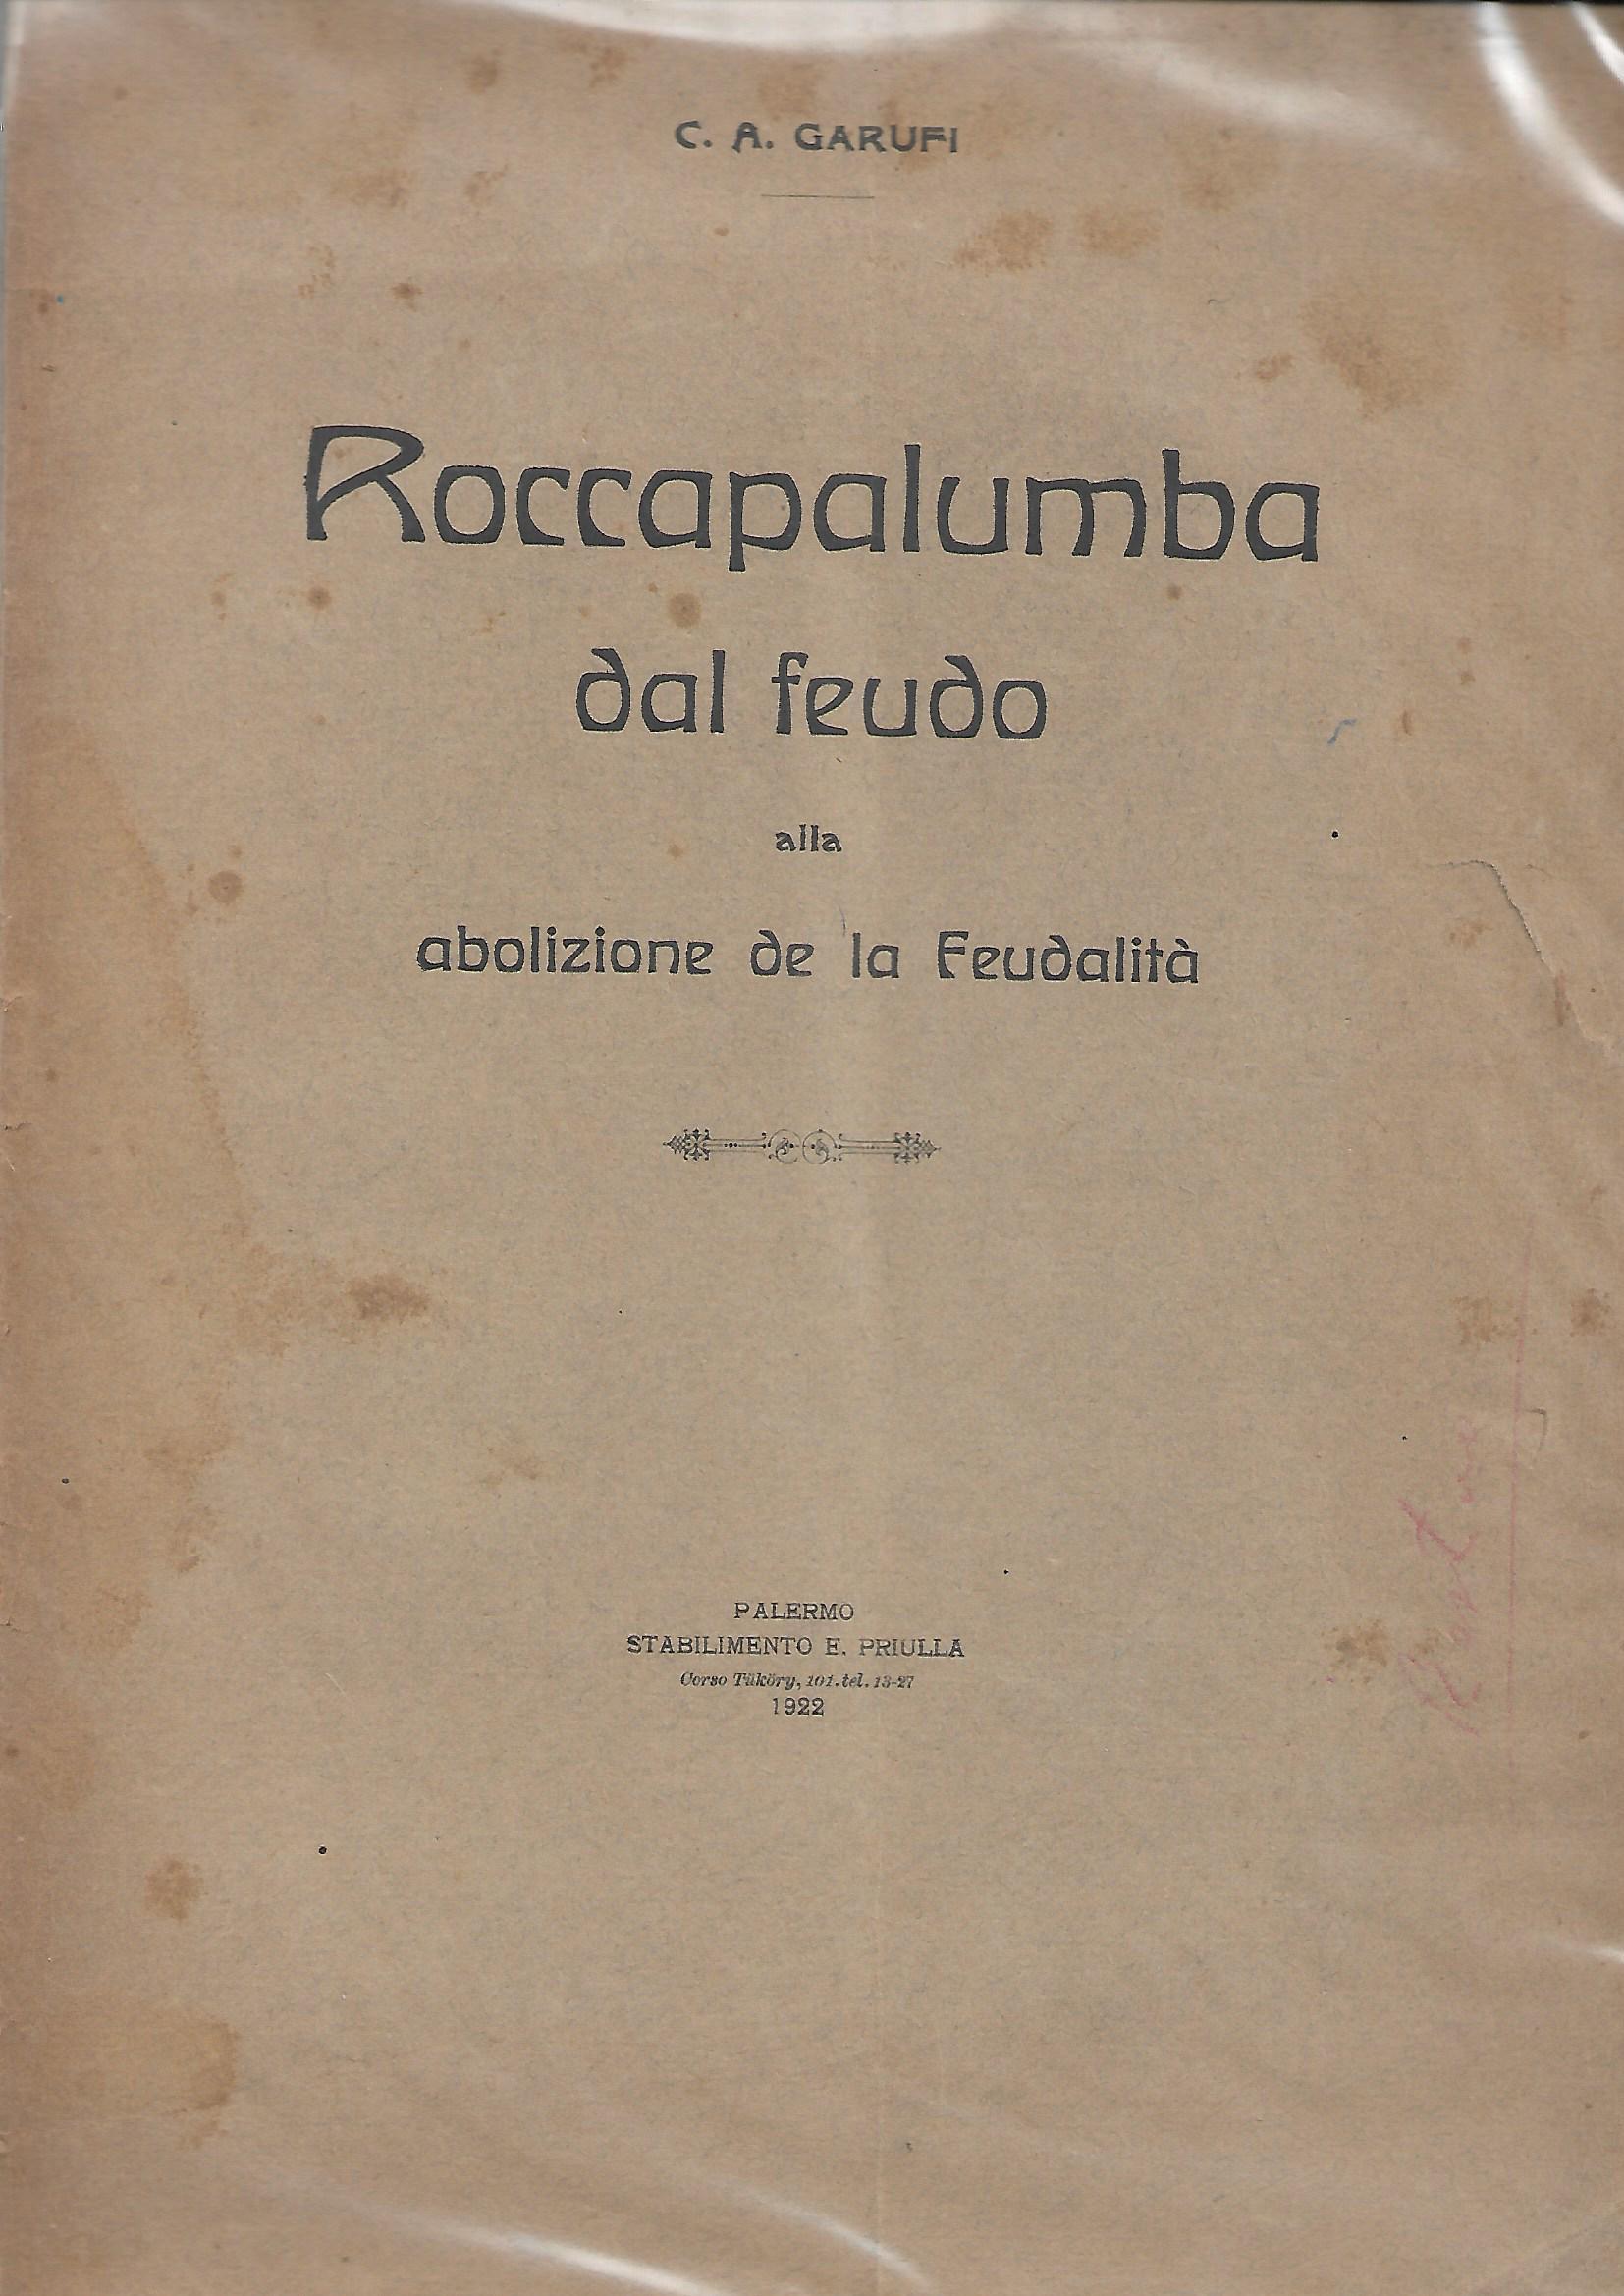 fallback-no-image-1715